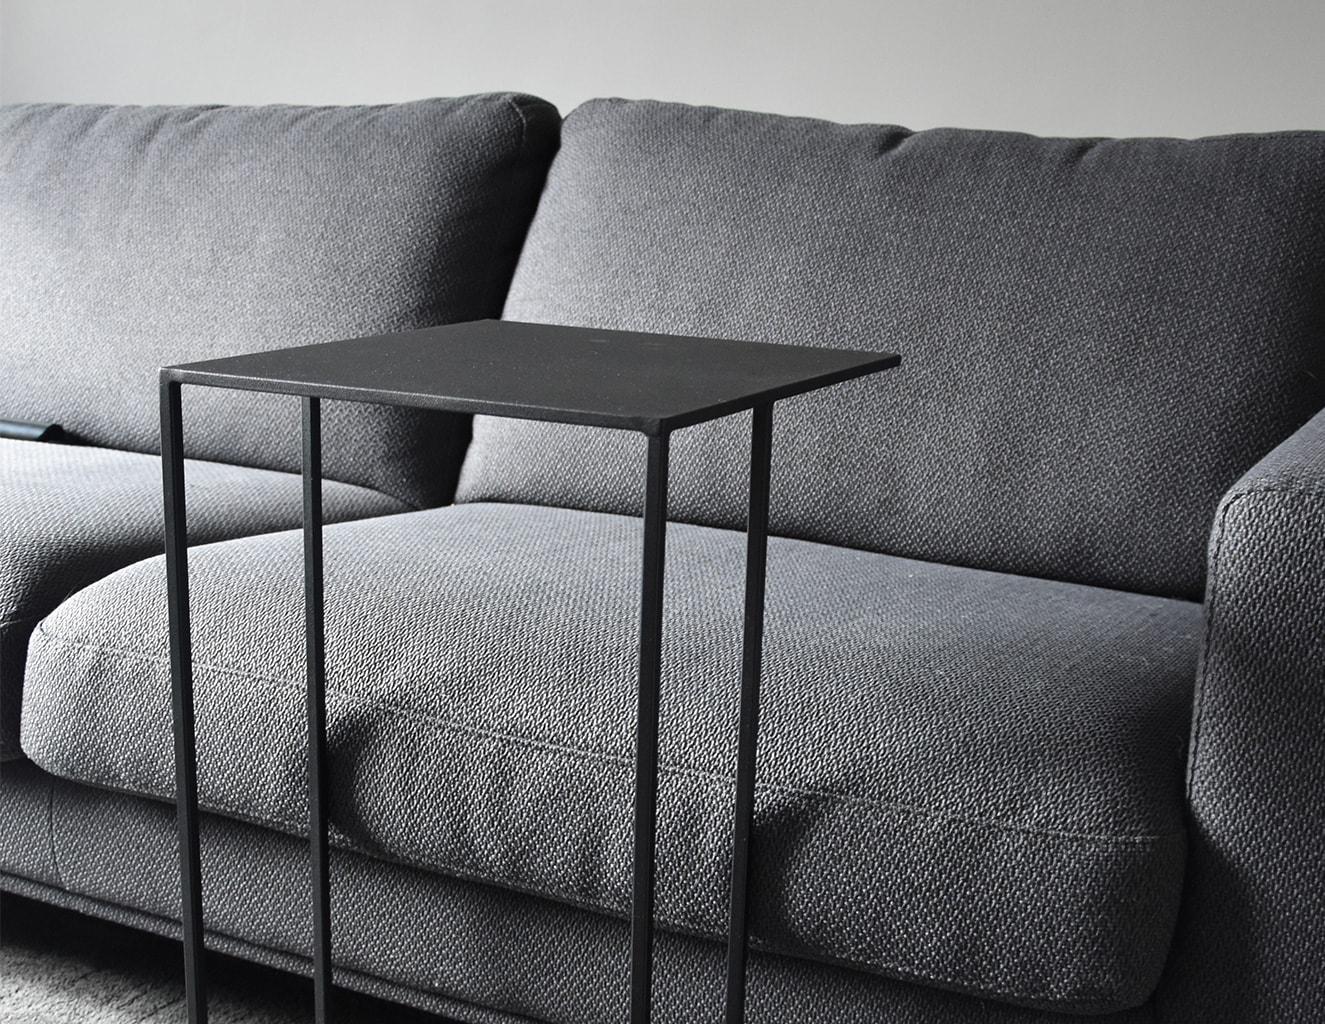 Minimalistic bijzettafel of banktafel modern nederlands ontwerp